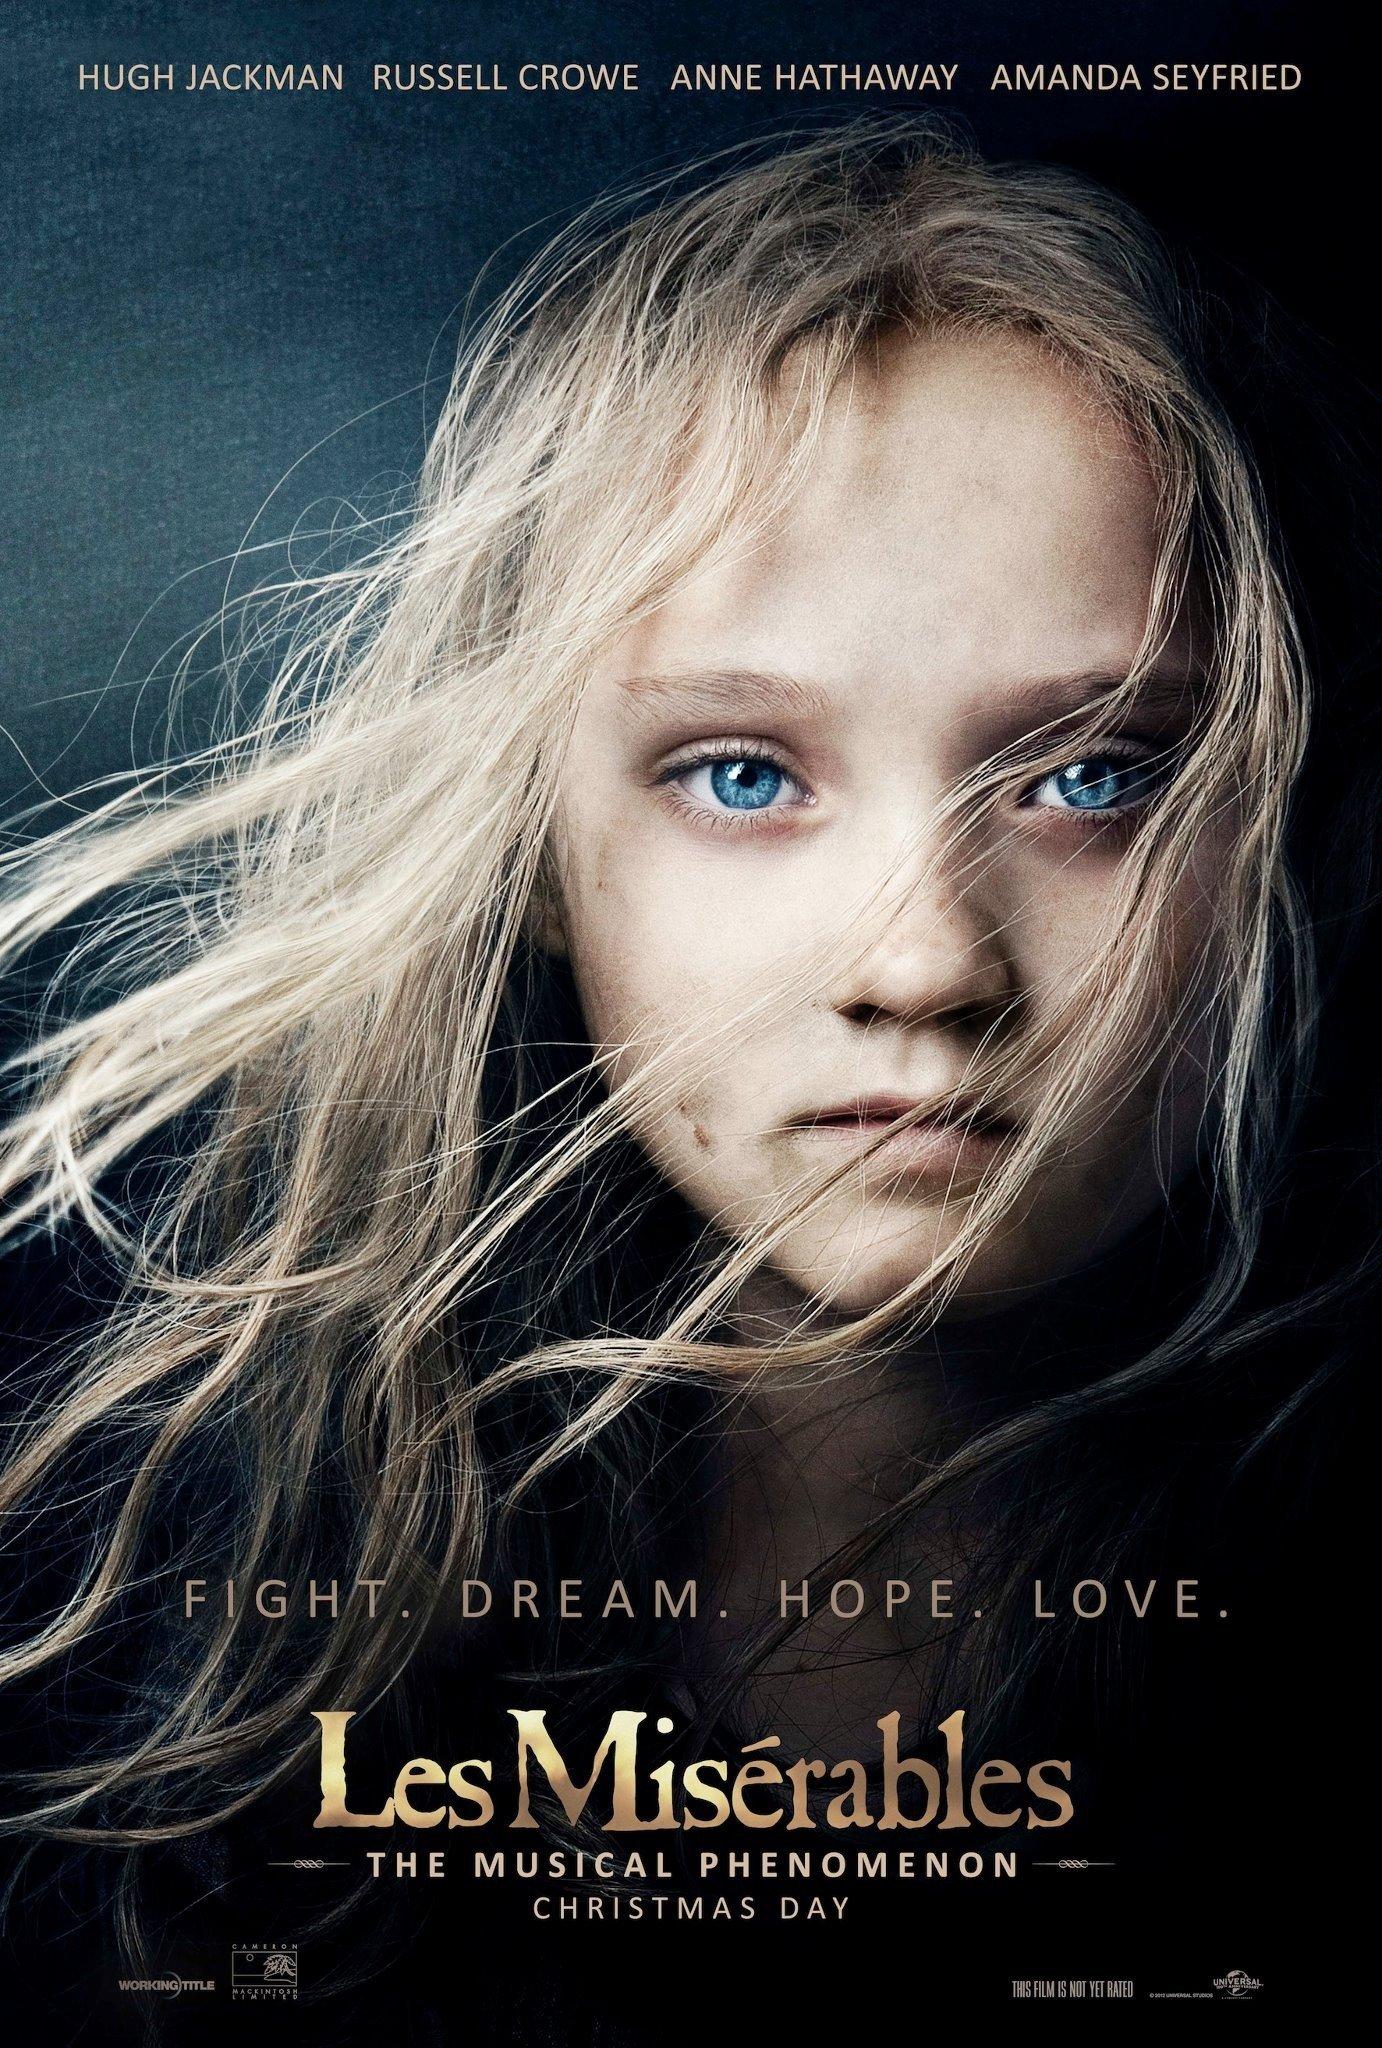 Sefiller 2012 İndir 720p-1080p Türkçe Dublaj TR-ENG BluRay Film